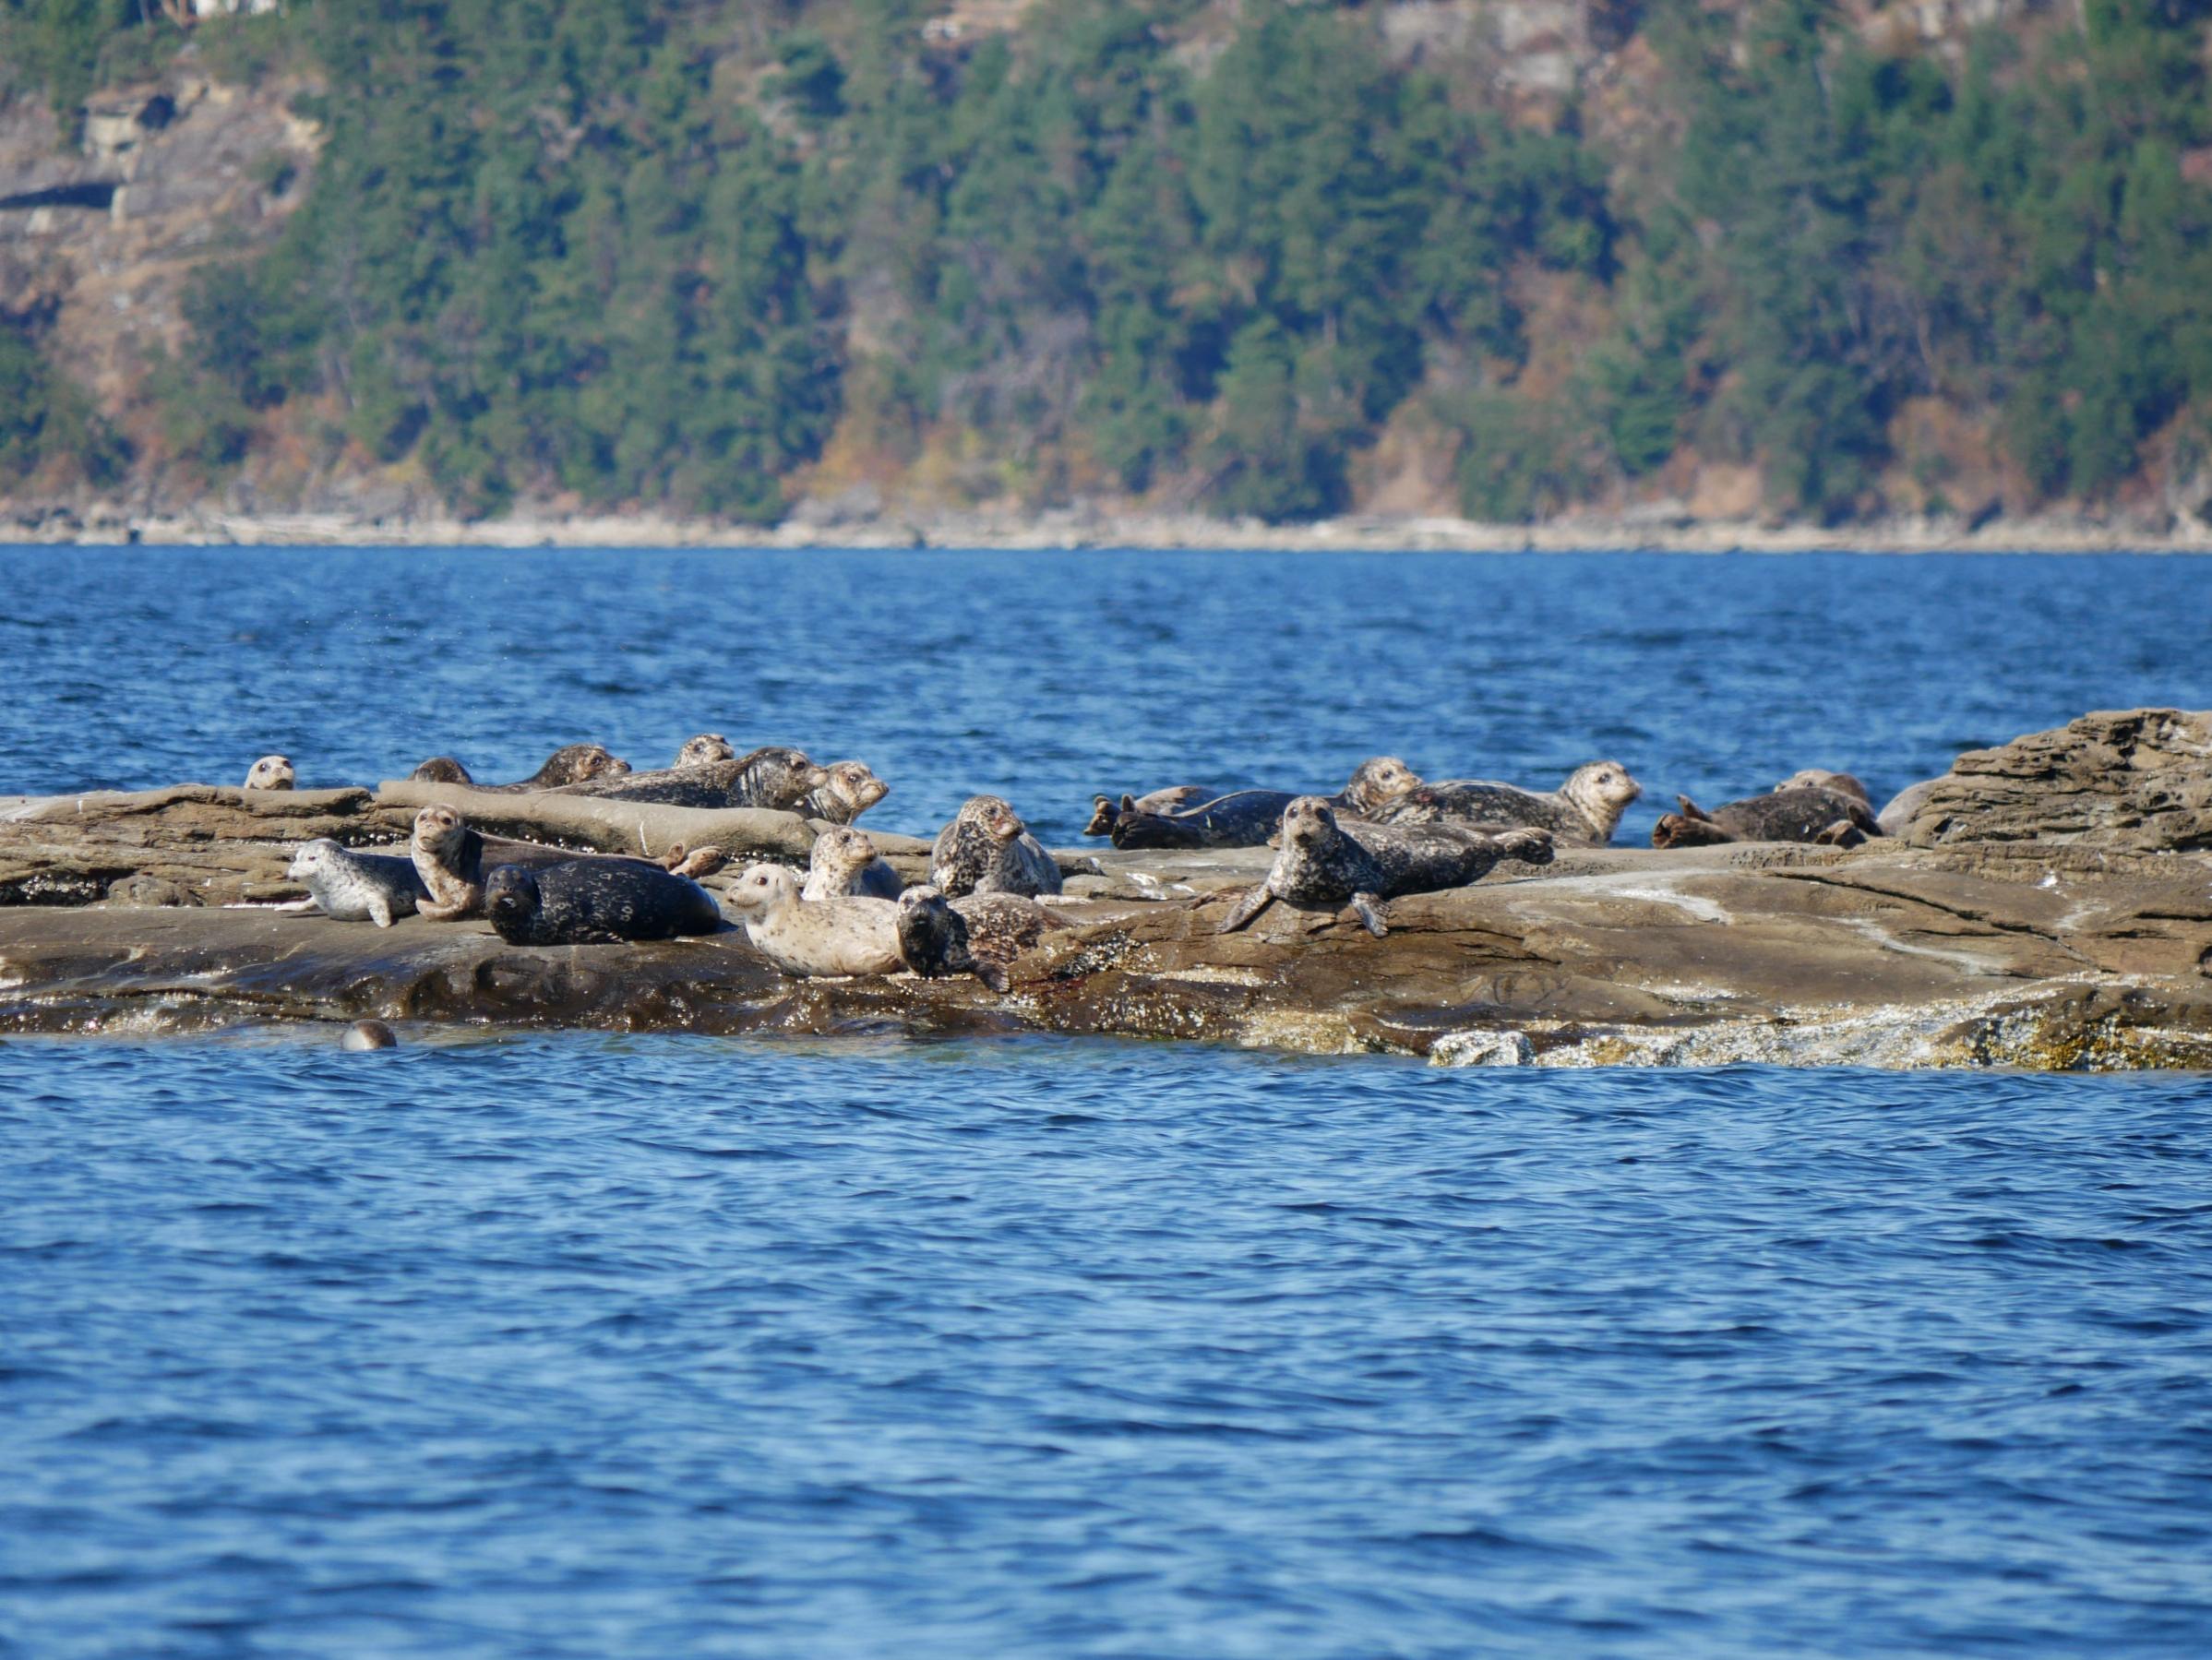 Harbour seals on alert. Photo by Alanna Vivani